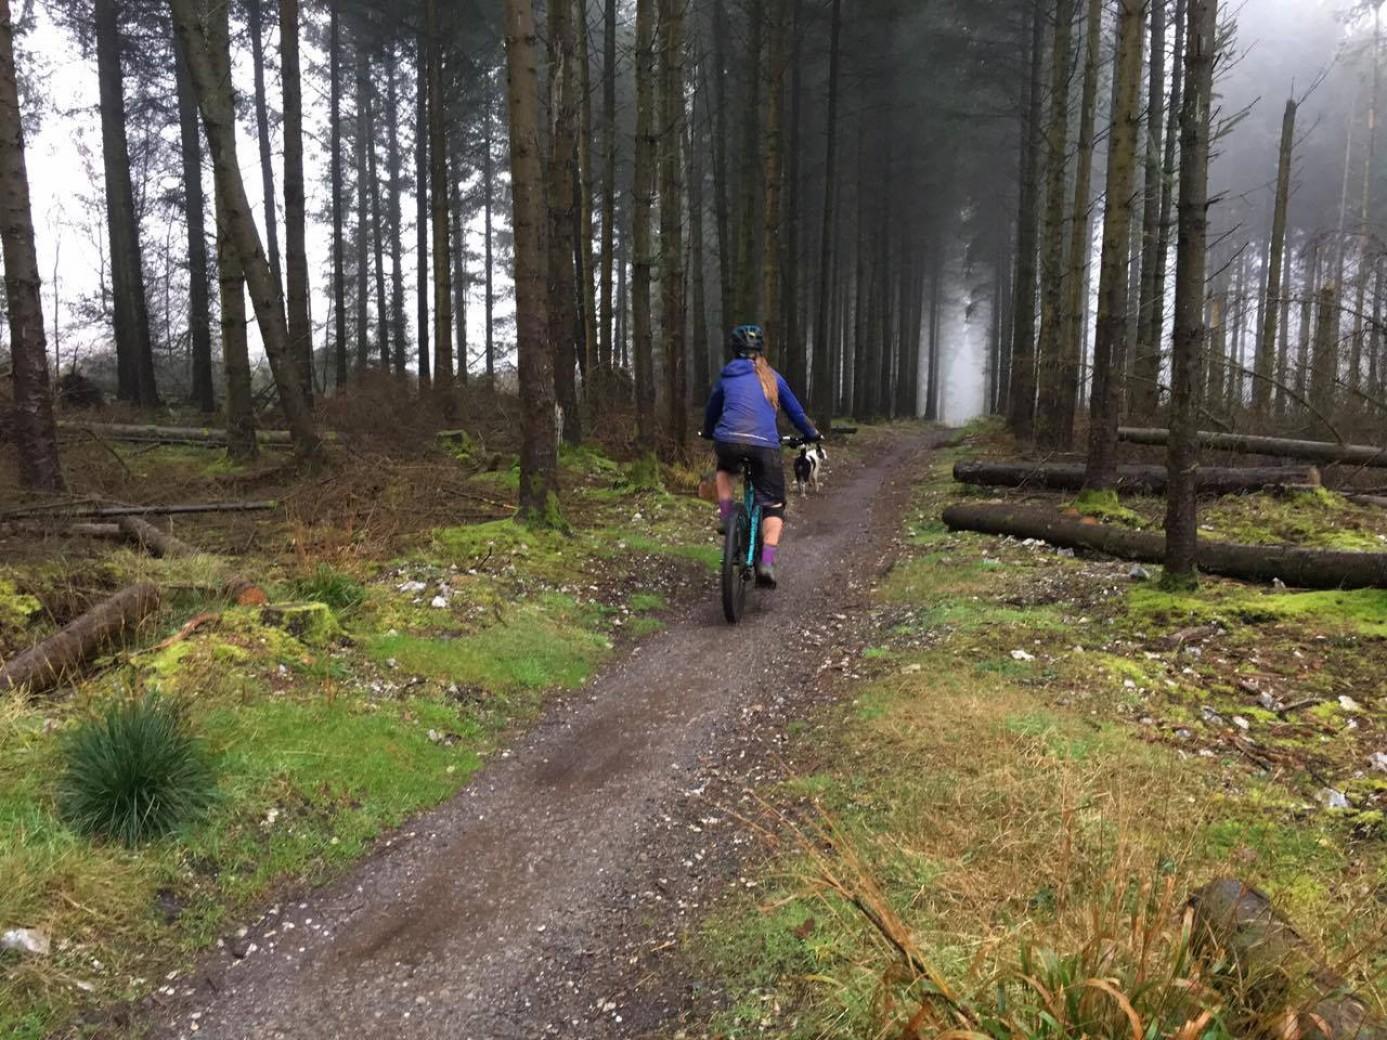 ventajas-salir-solo-bicicleta/